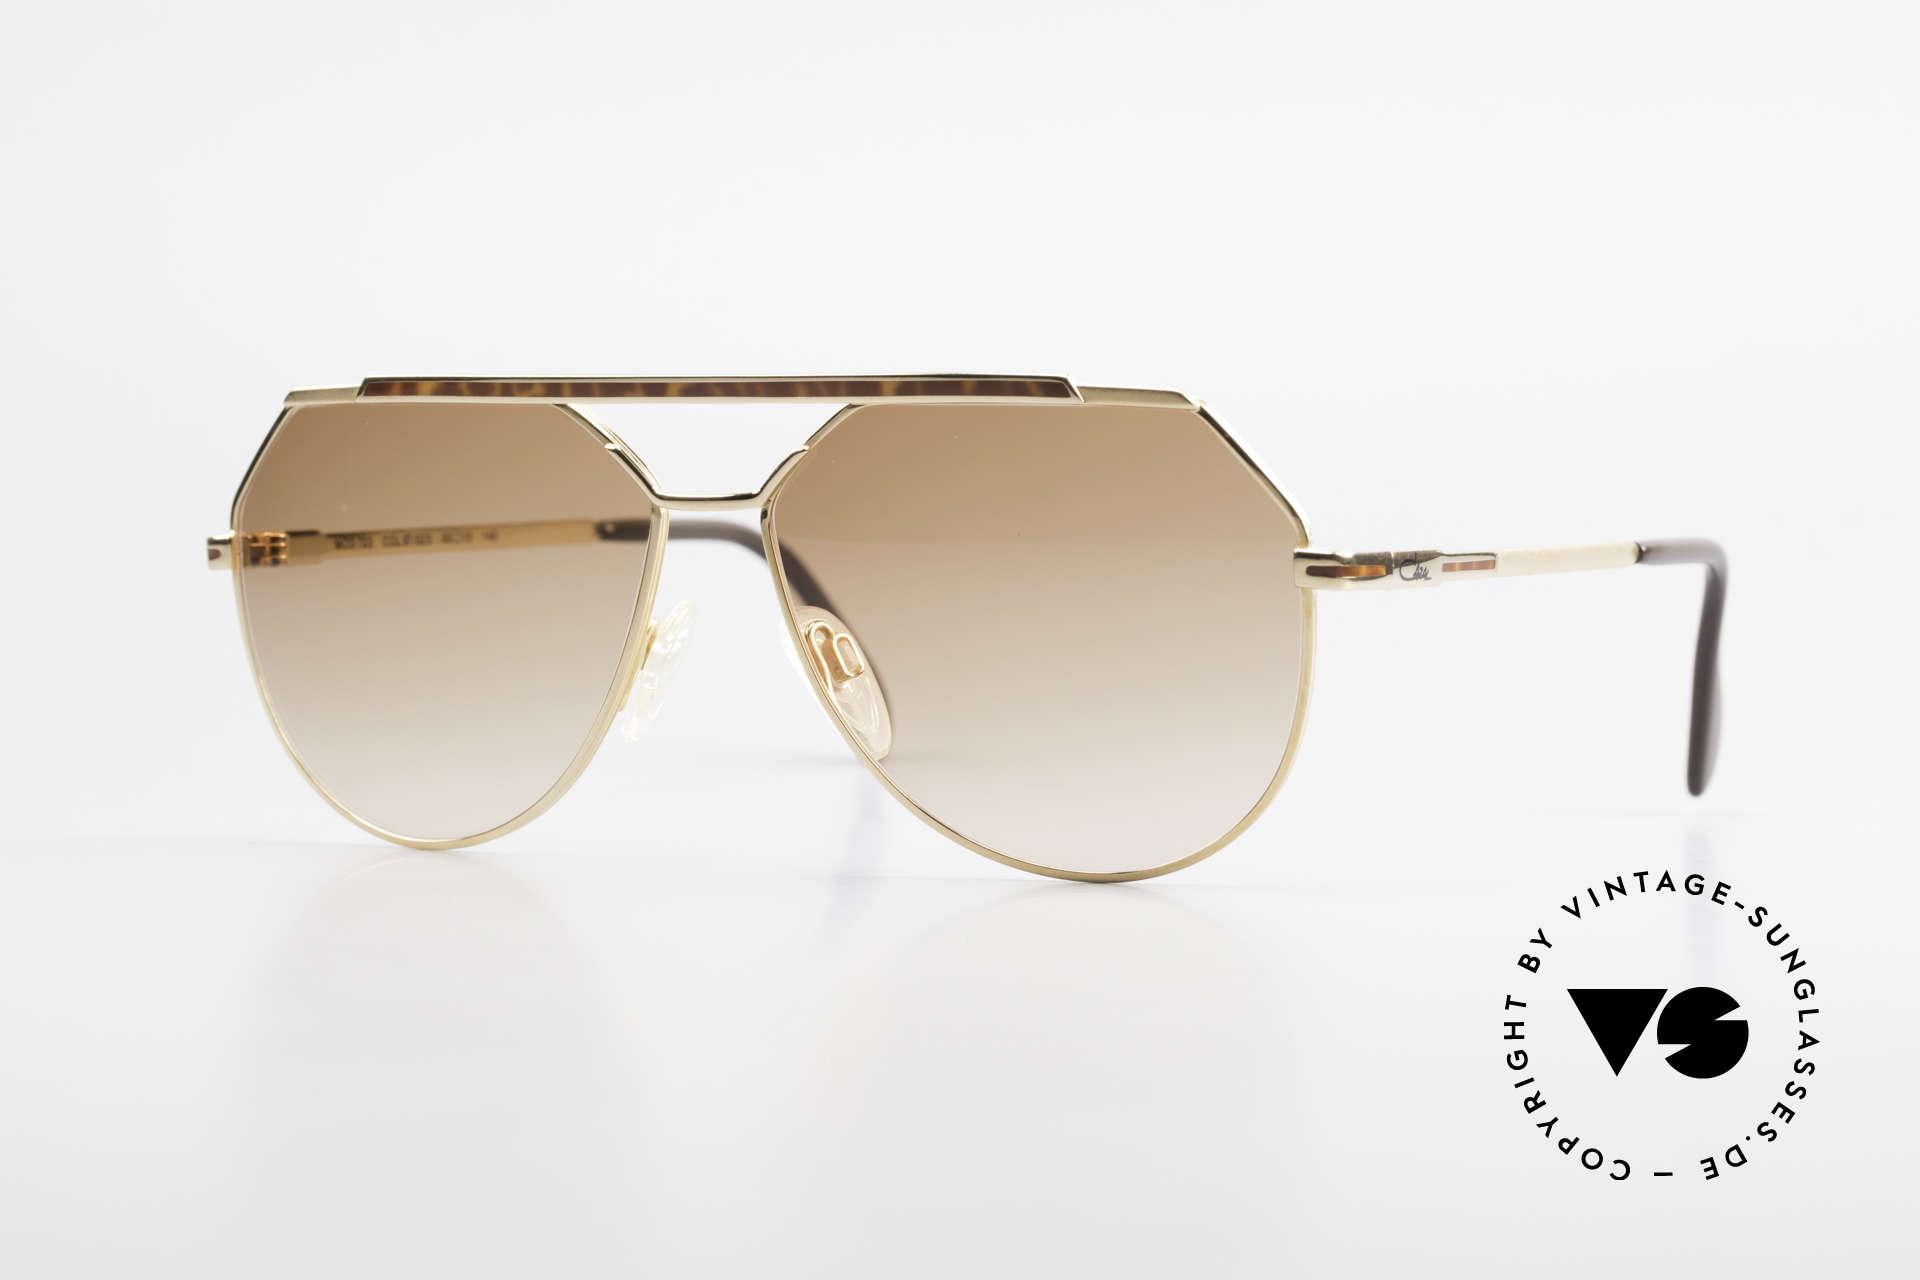 Cazal 733 80's Men's Aviator Sunglasses, striking CAZAL sunglasses for men from 1986/87/88, Made for Men